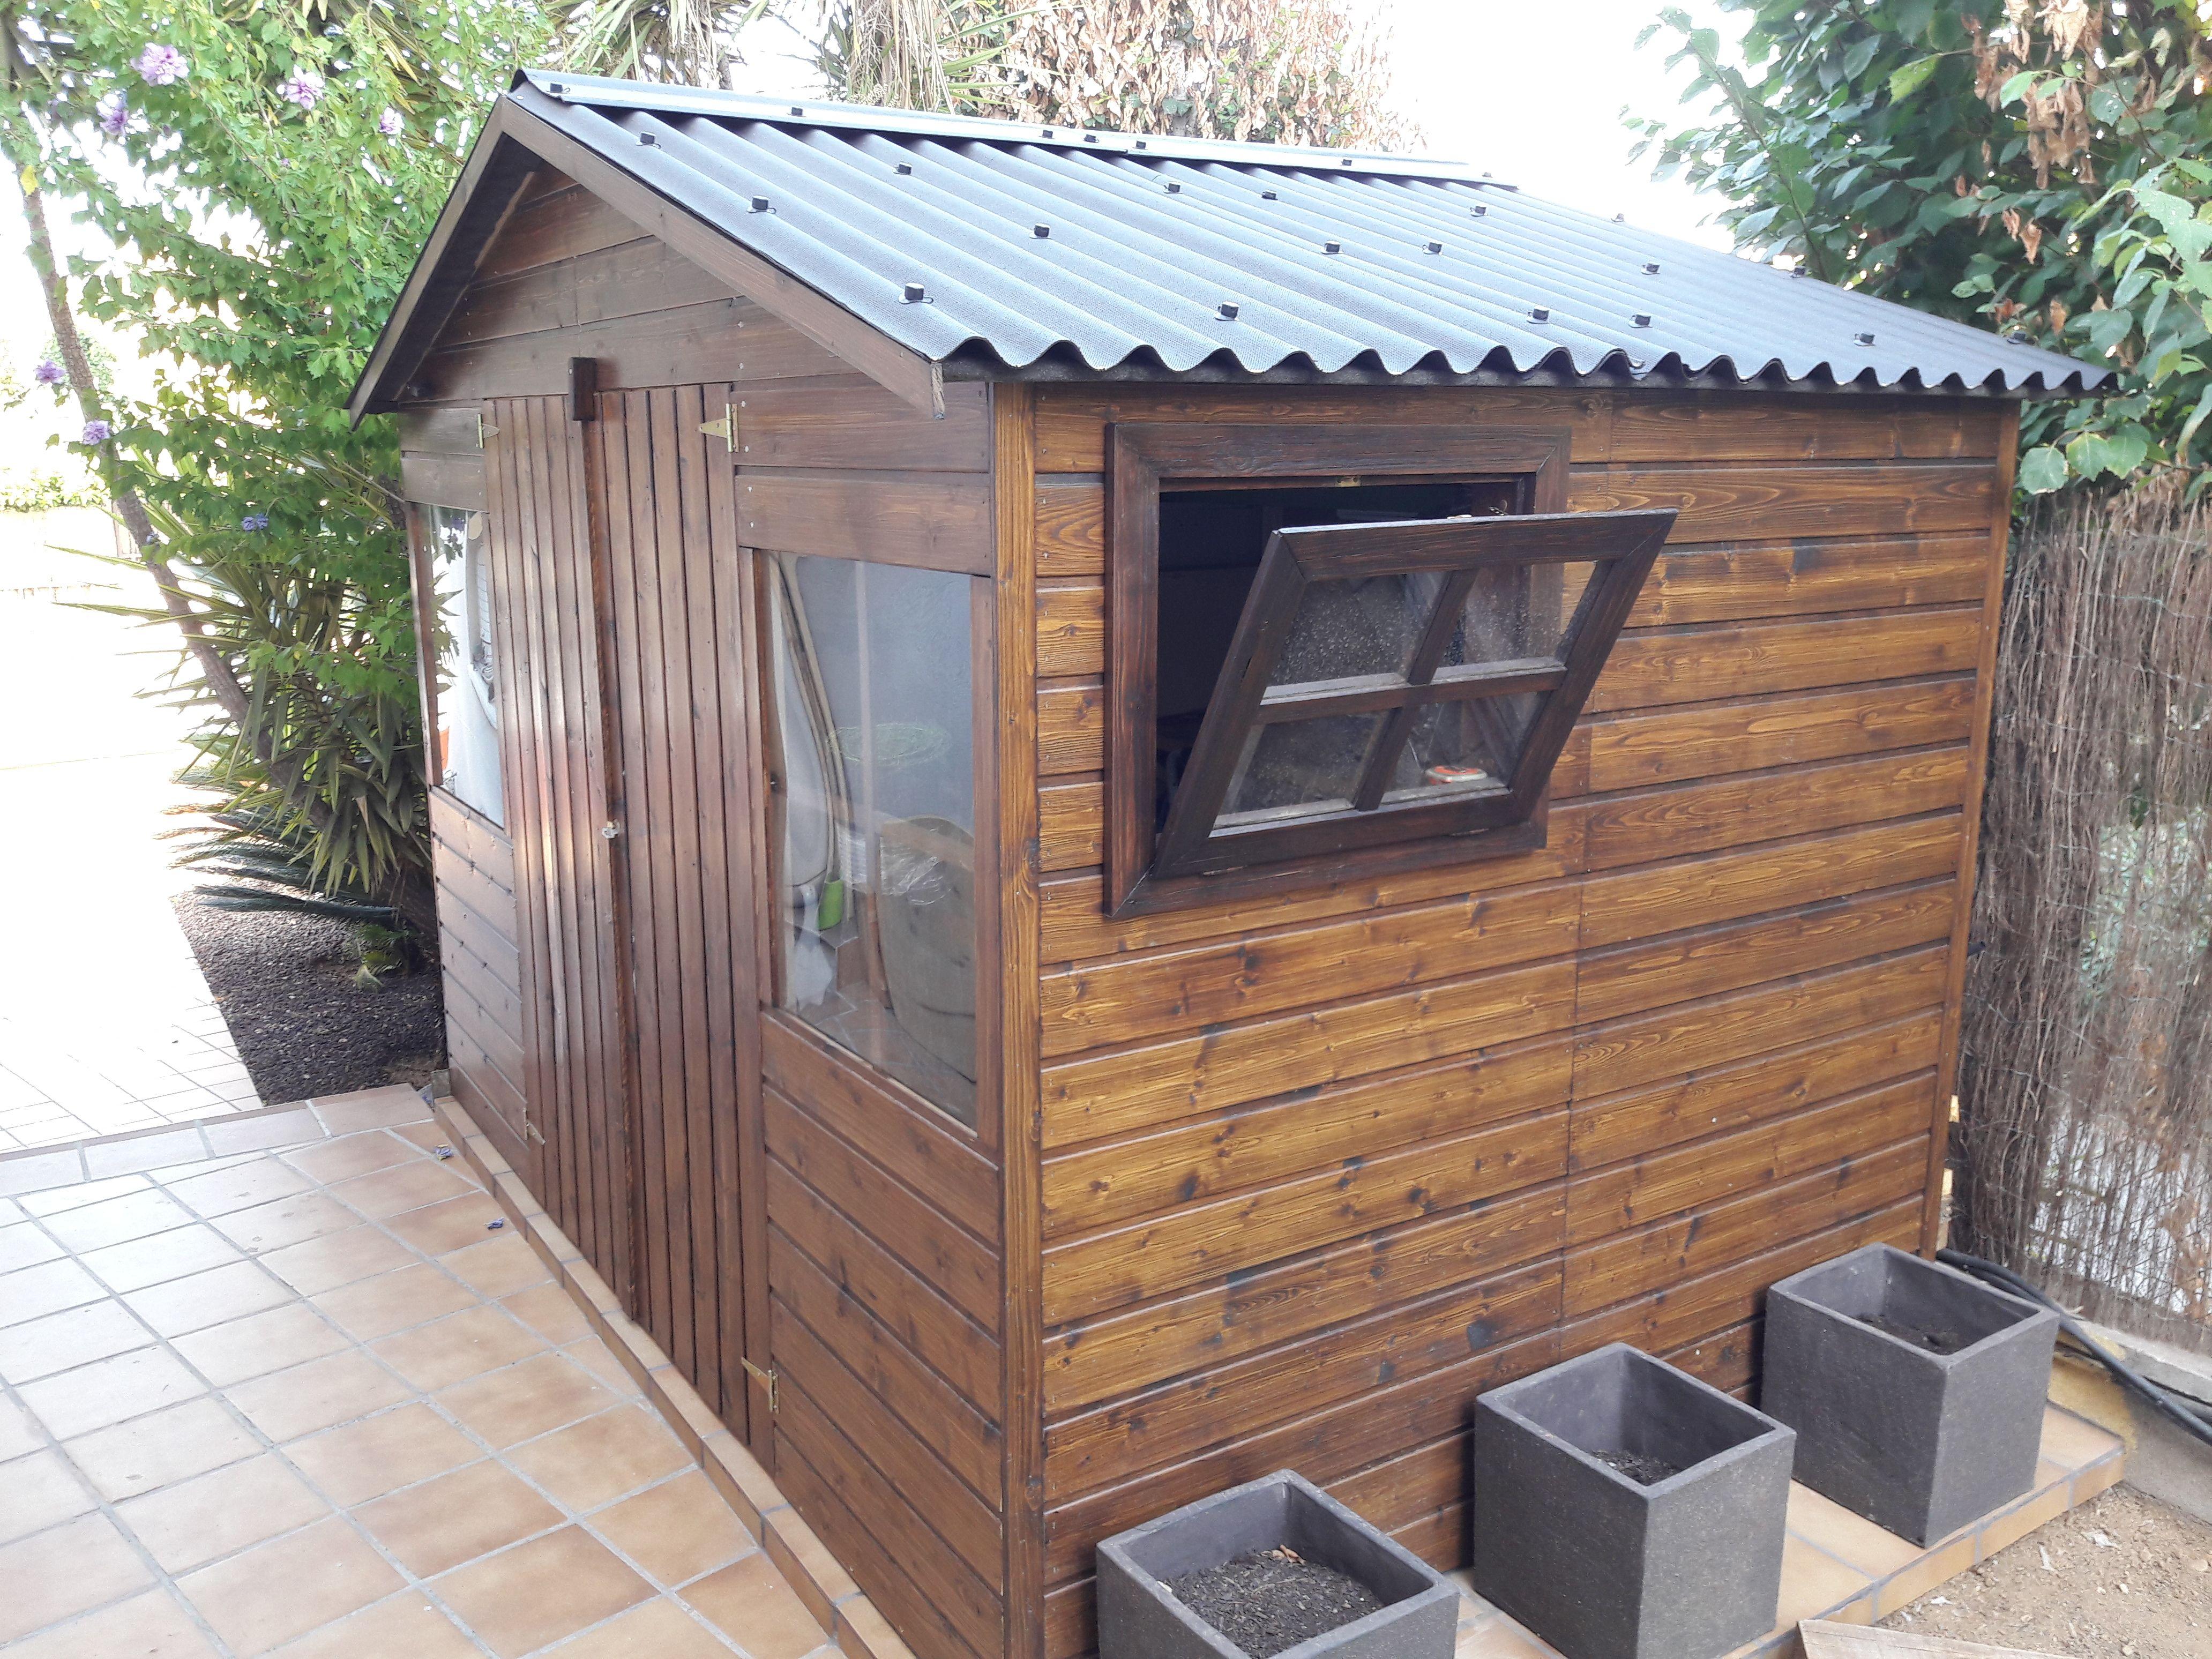 Caseta de madera fresno personalizada con techo asf ltico for Casetas de madera para jardin baratas